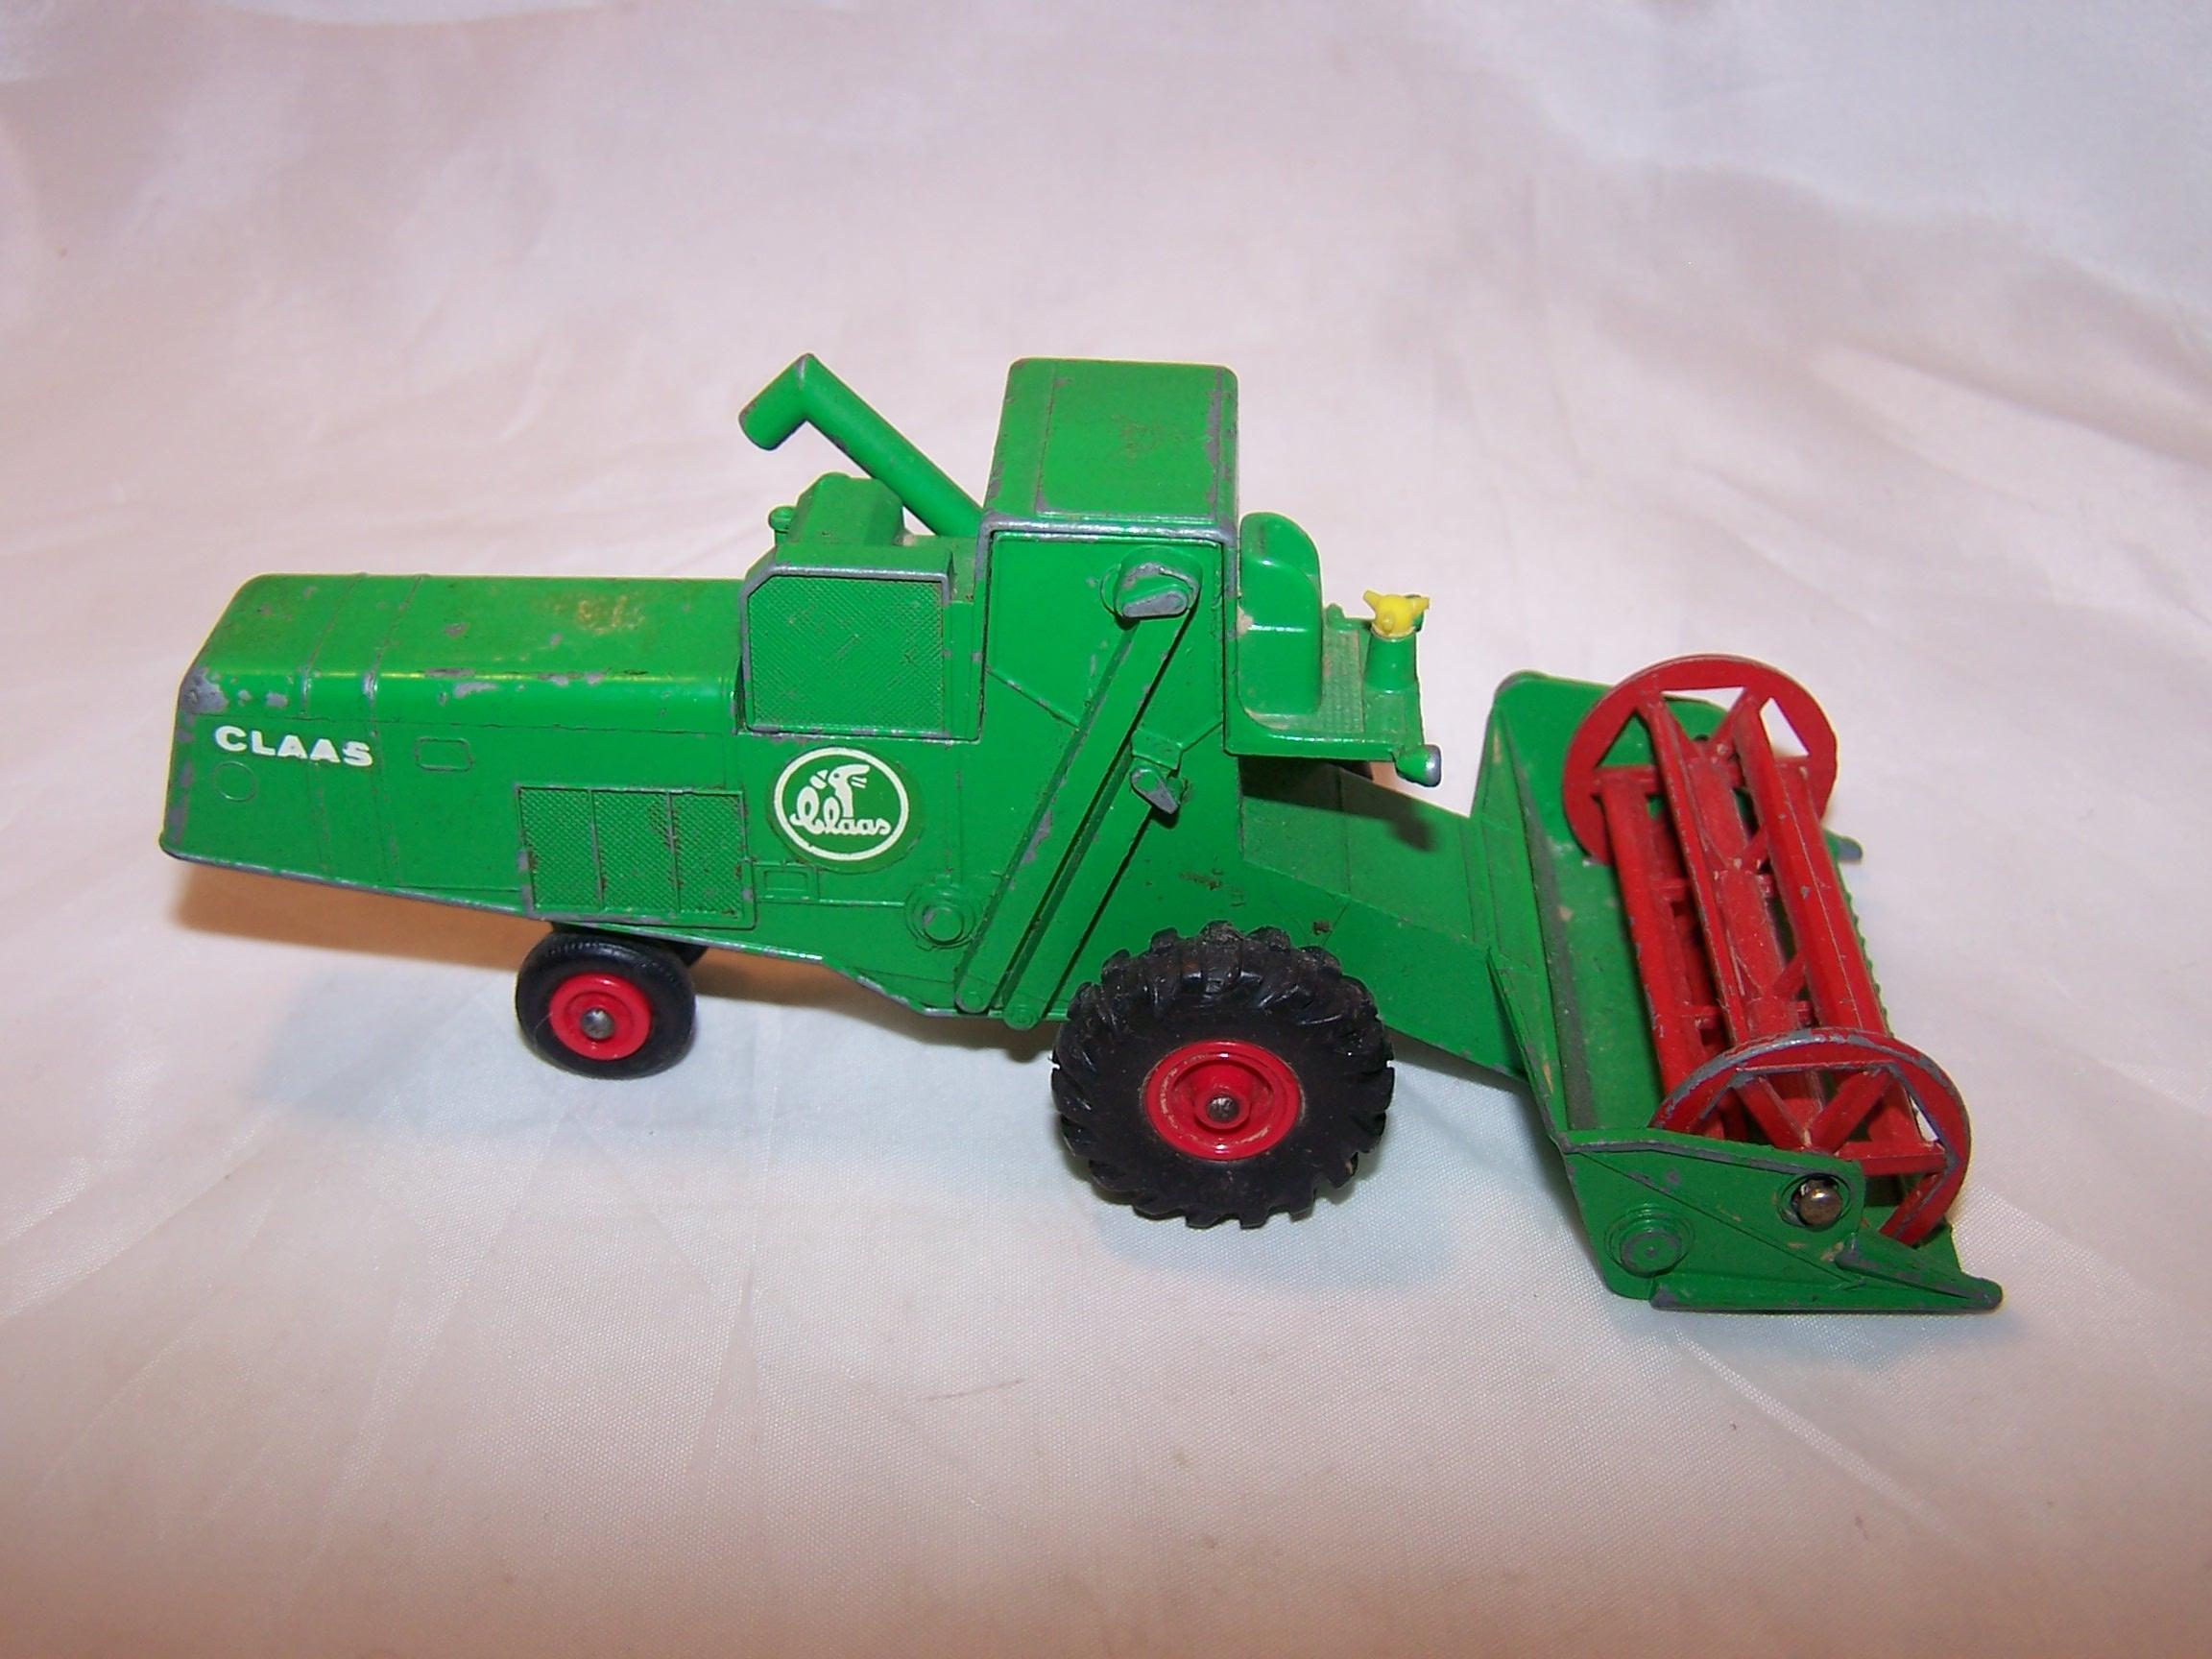 Claas Combine Harvester K9, Matchbox, Lesney